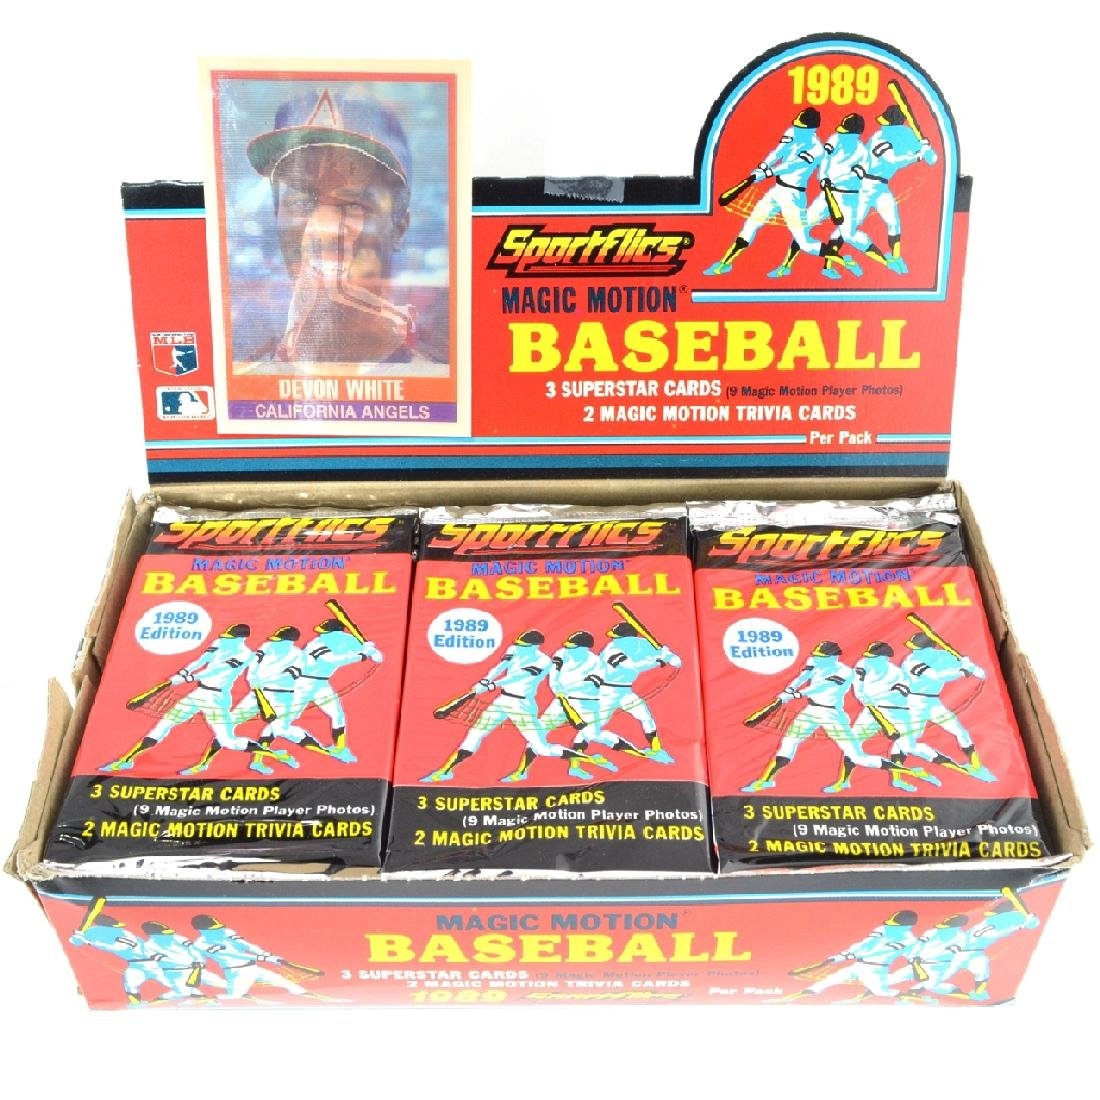 1989 Sportflics Magic Motion Baseball Card Set